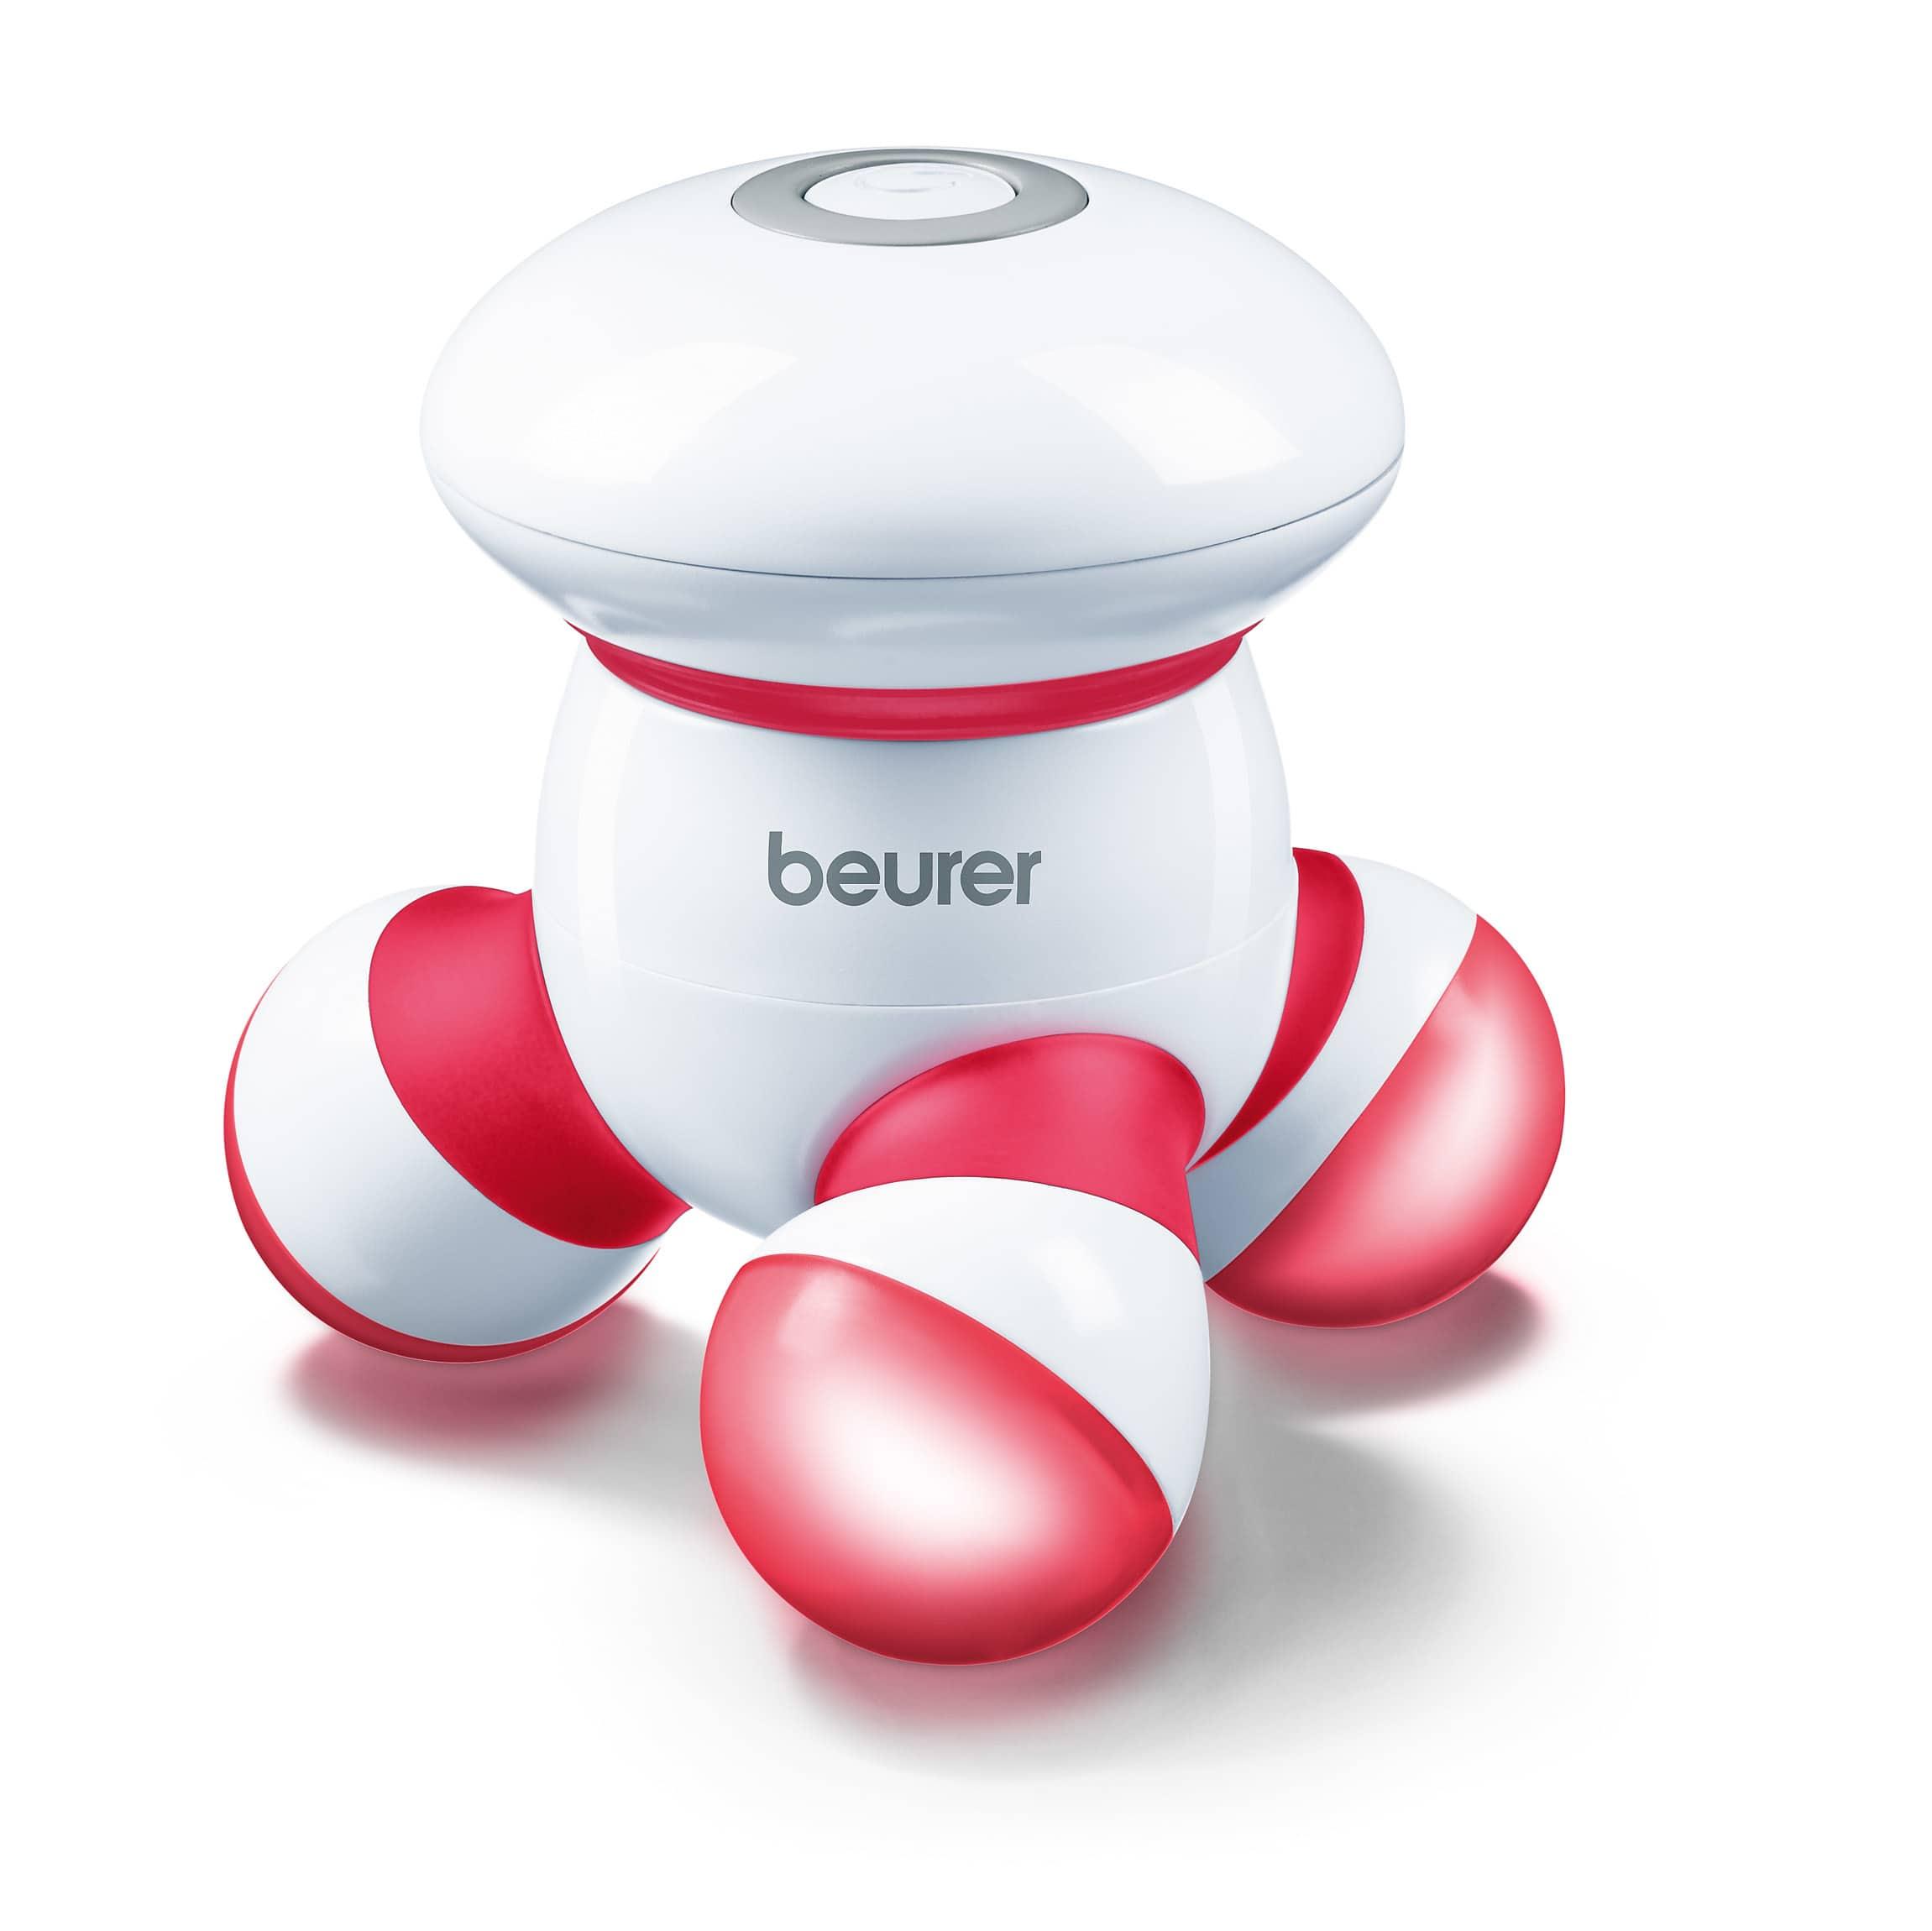 Beurer MG16 Mini-Massagegerät LED-Licht Massage-to-go Vibrationsmassage für 15,46 Euro